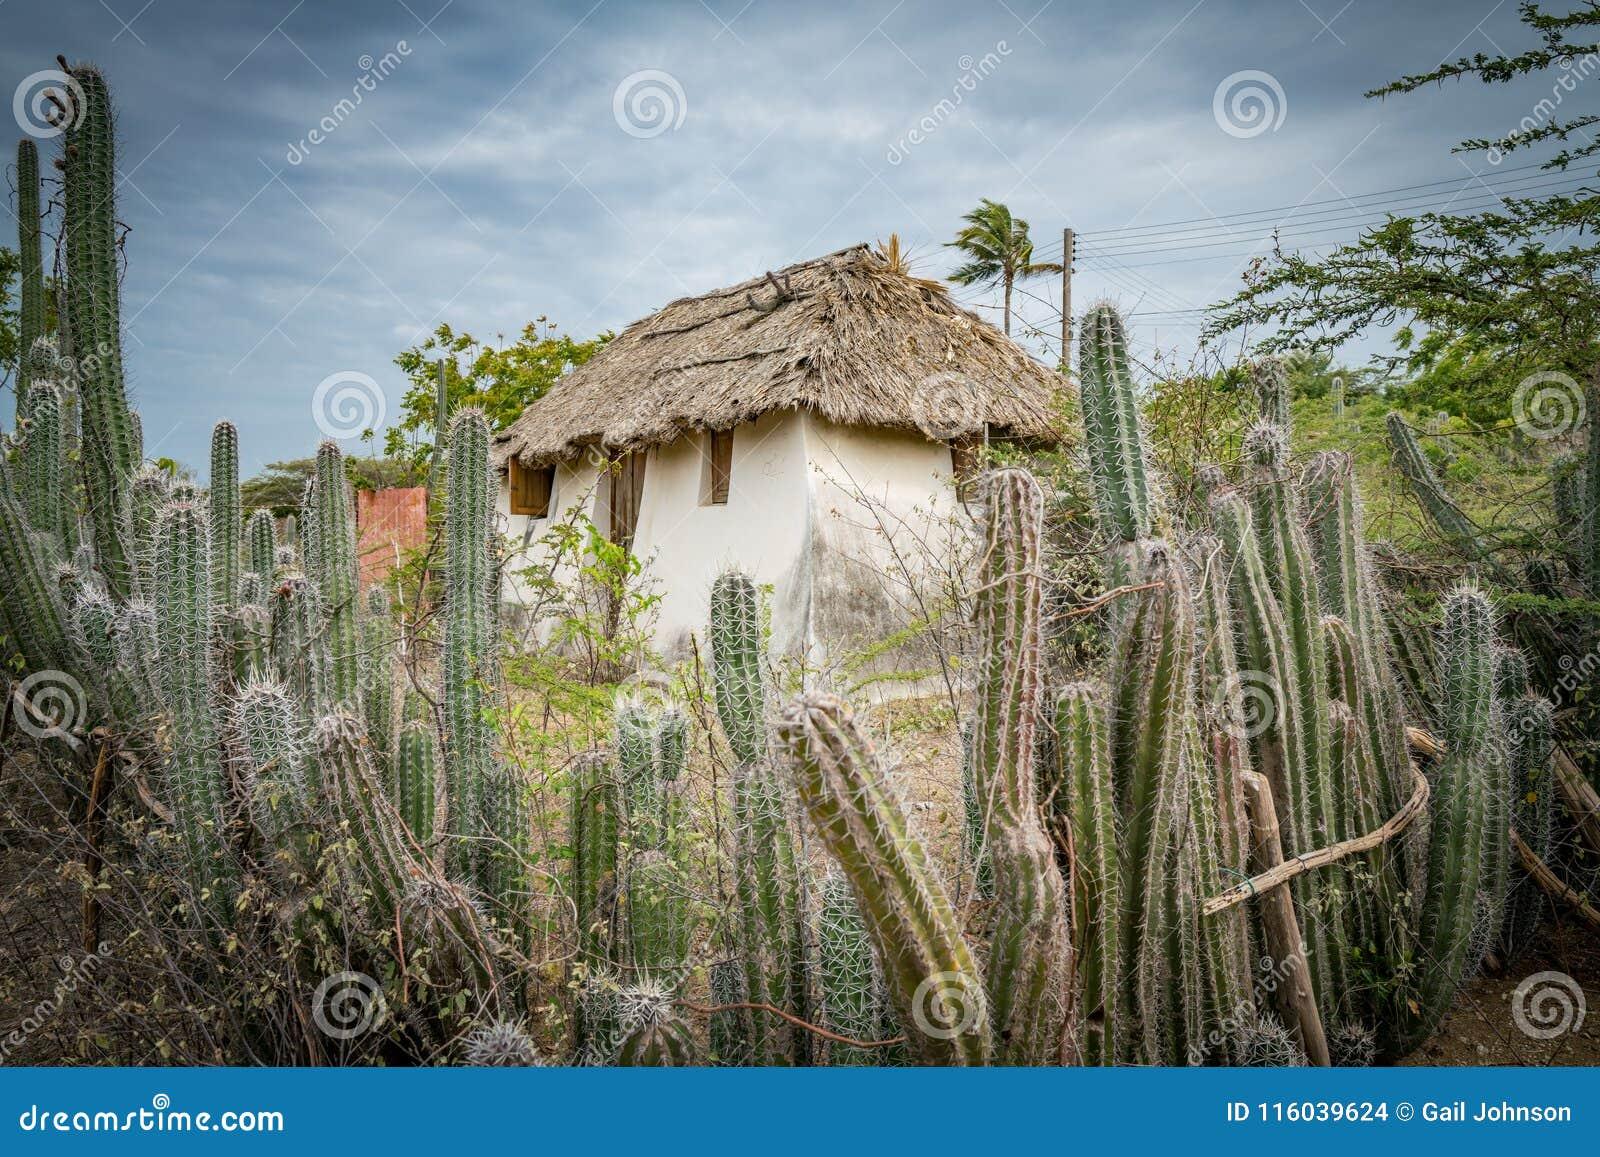 An old Slave hut - cactus fence Curacao Views